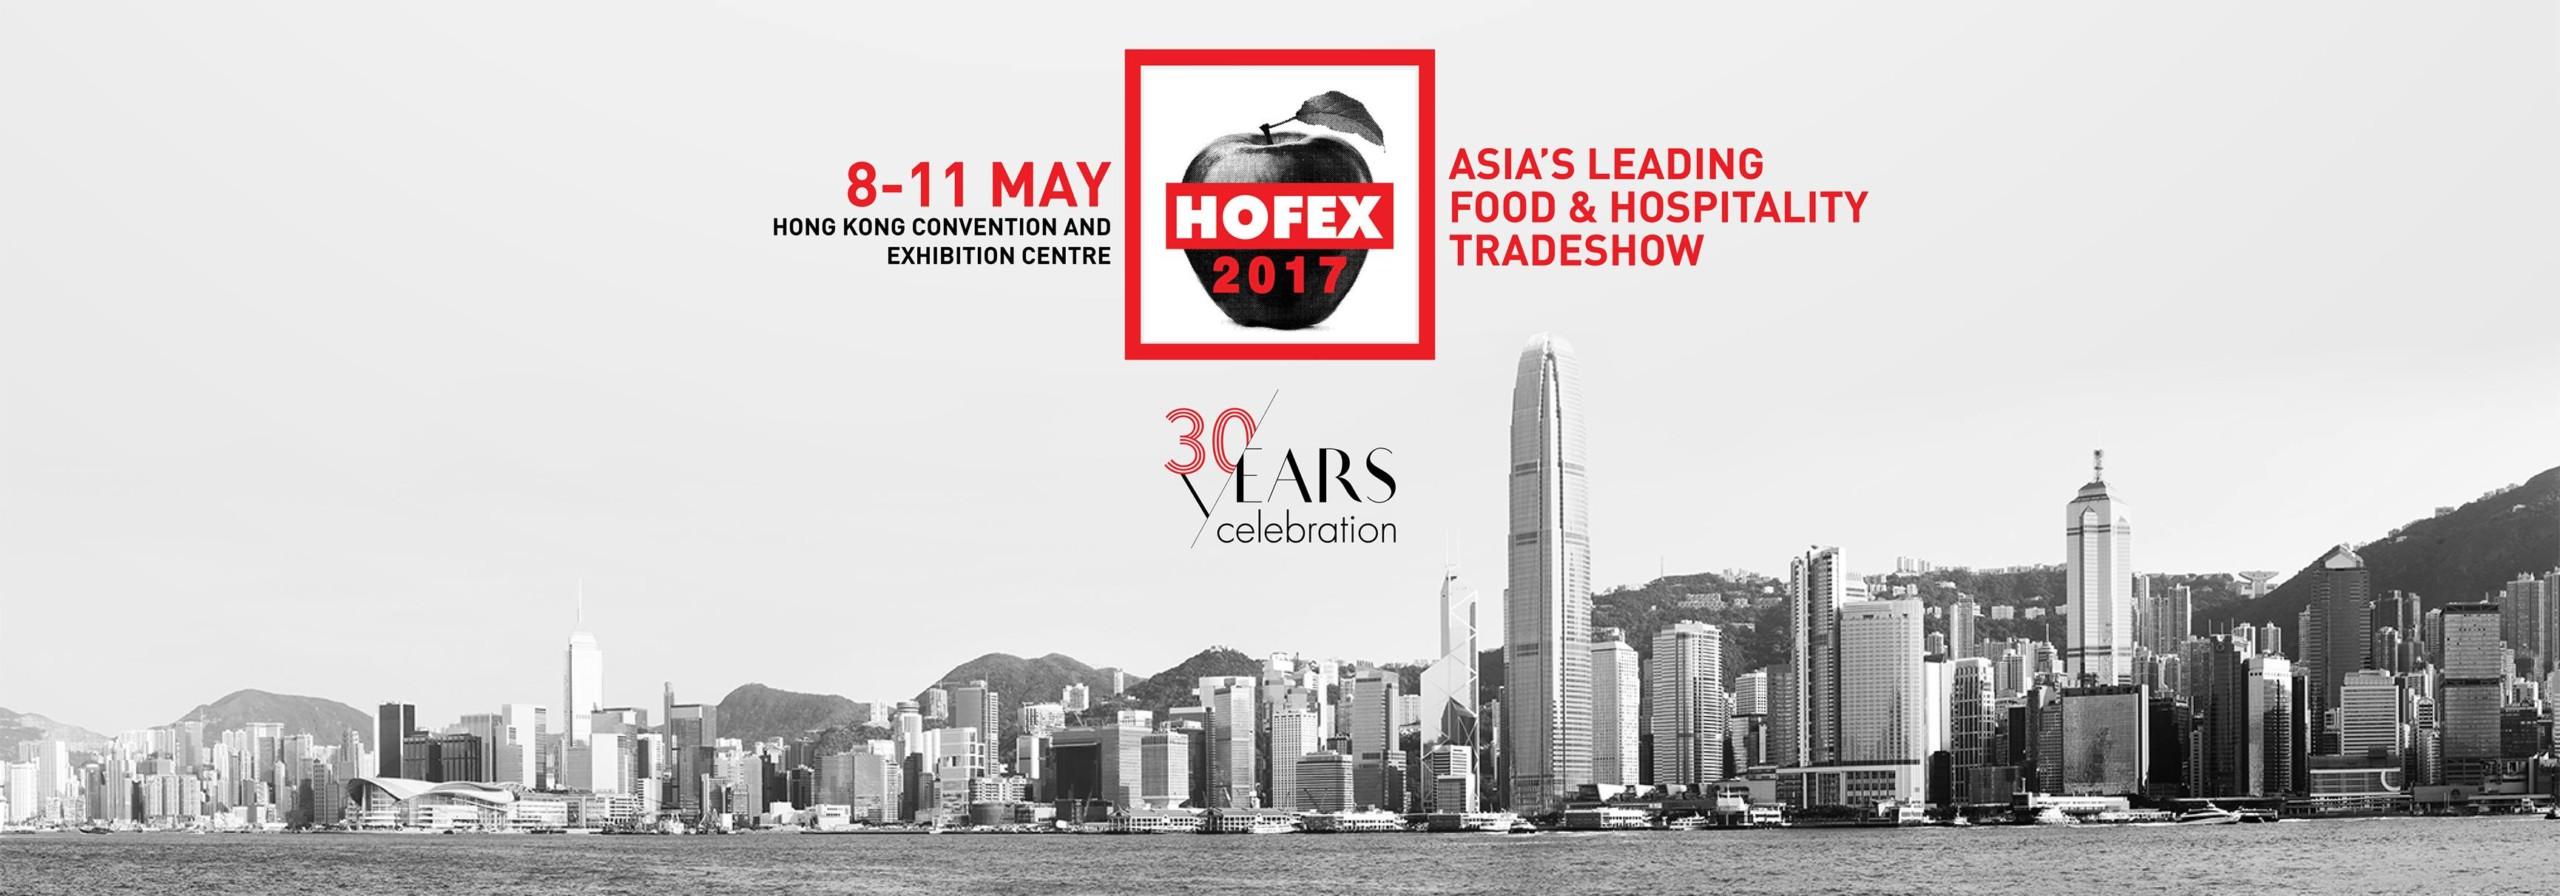 HOFEX 2017 in Hong Kong